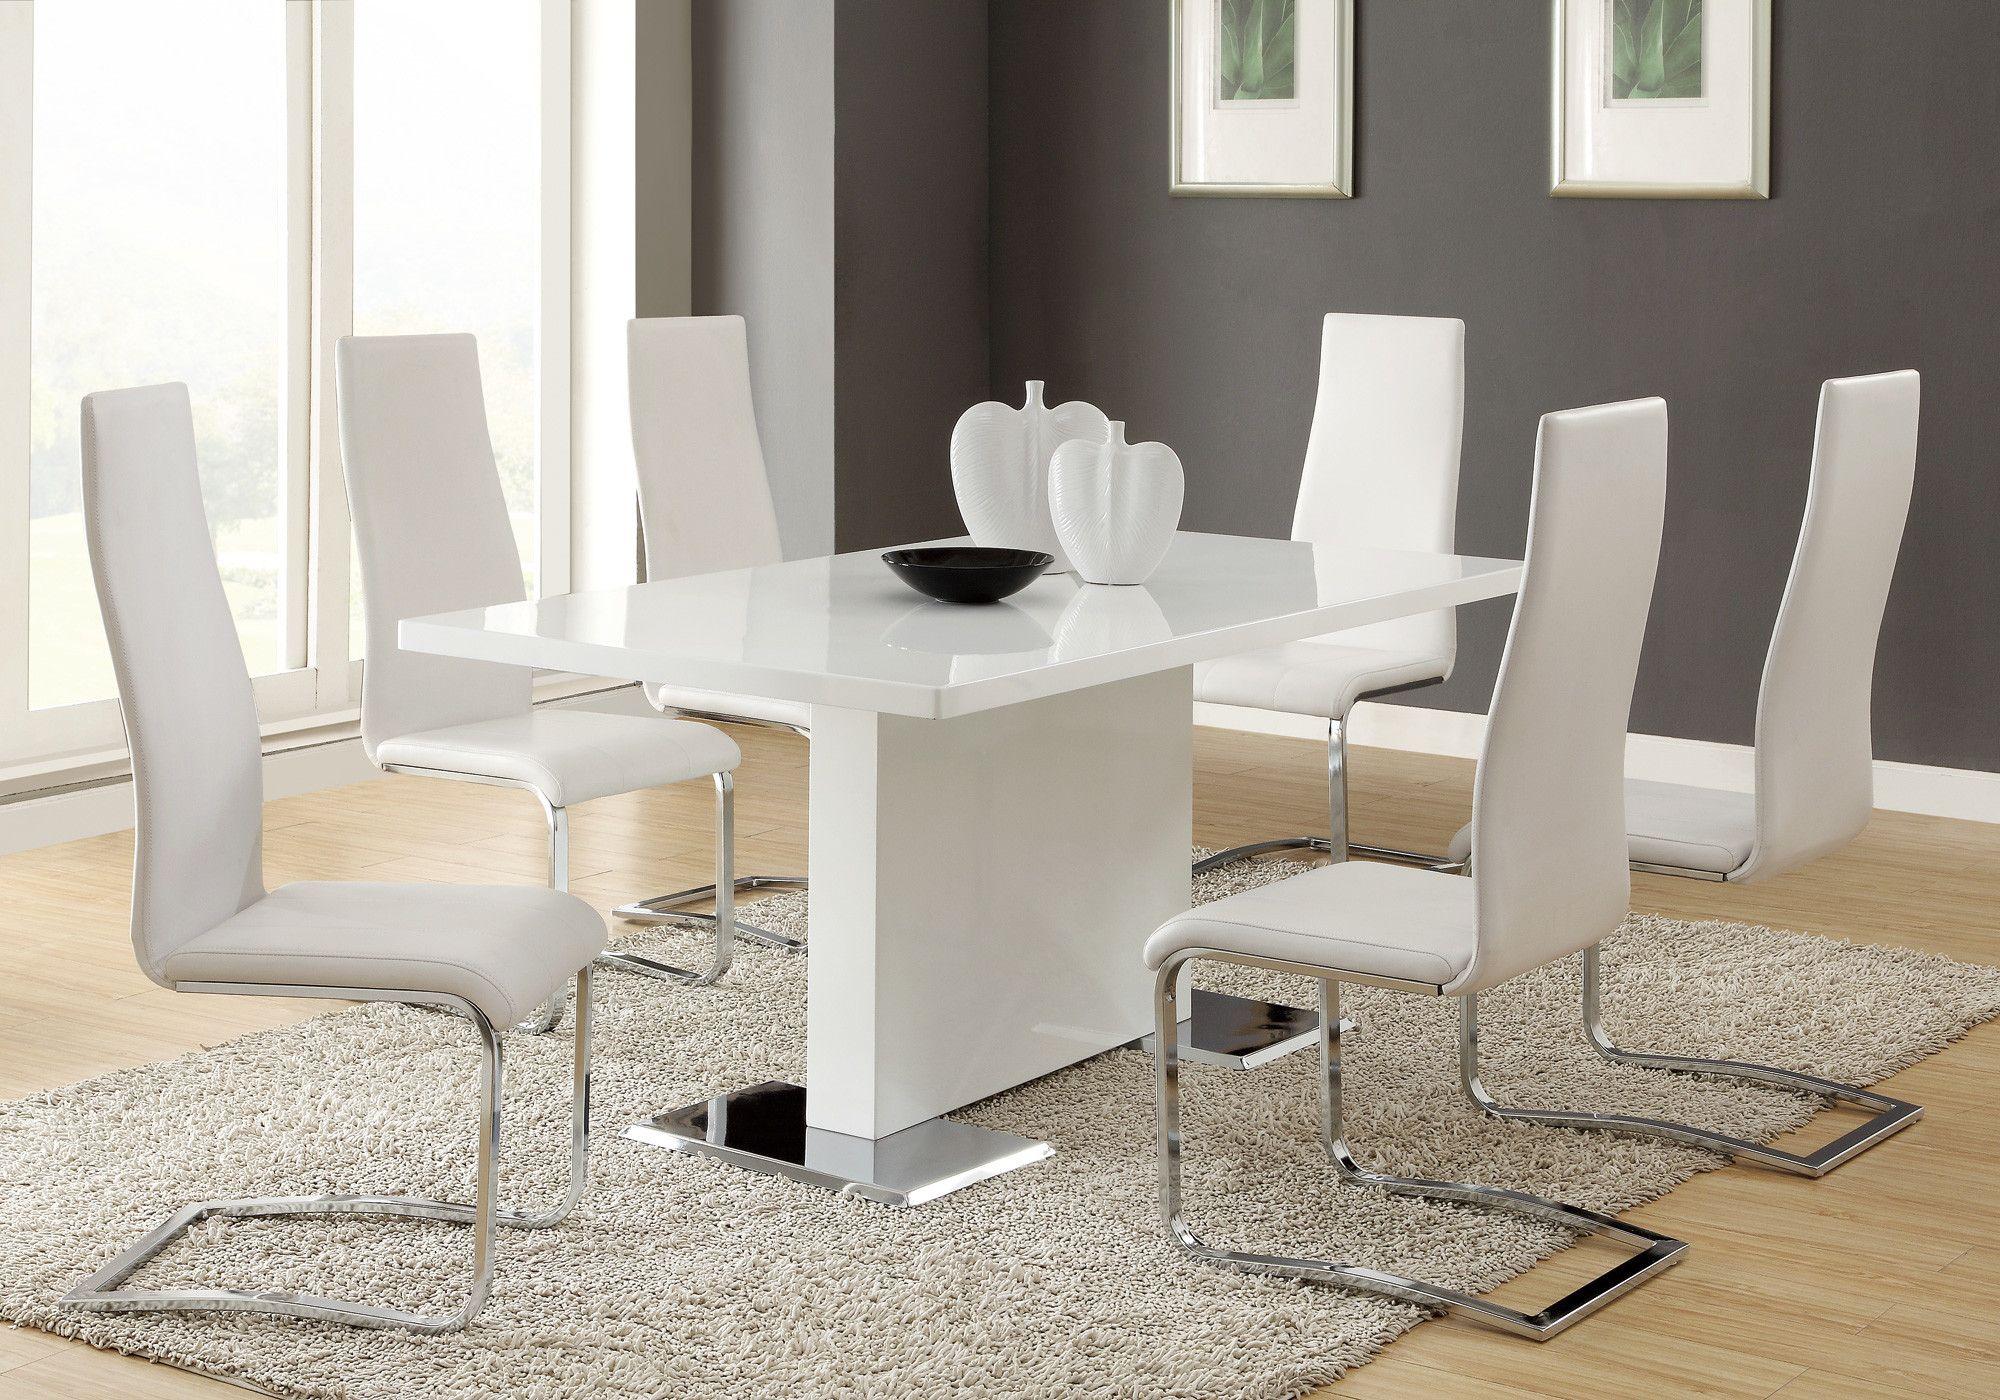 Wildon Home ® 9 Piece Dining Set | Wayfair (1 table, 8 chairs ...